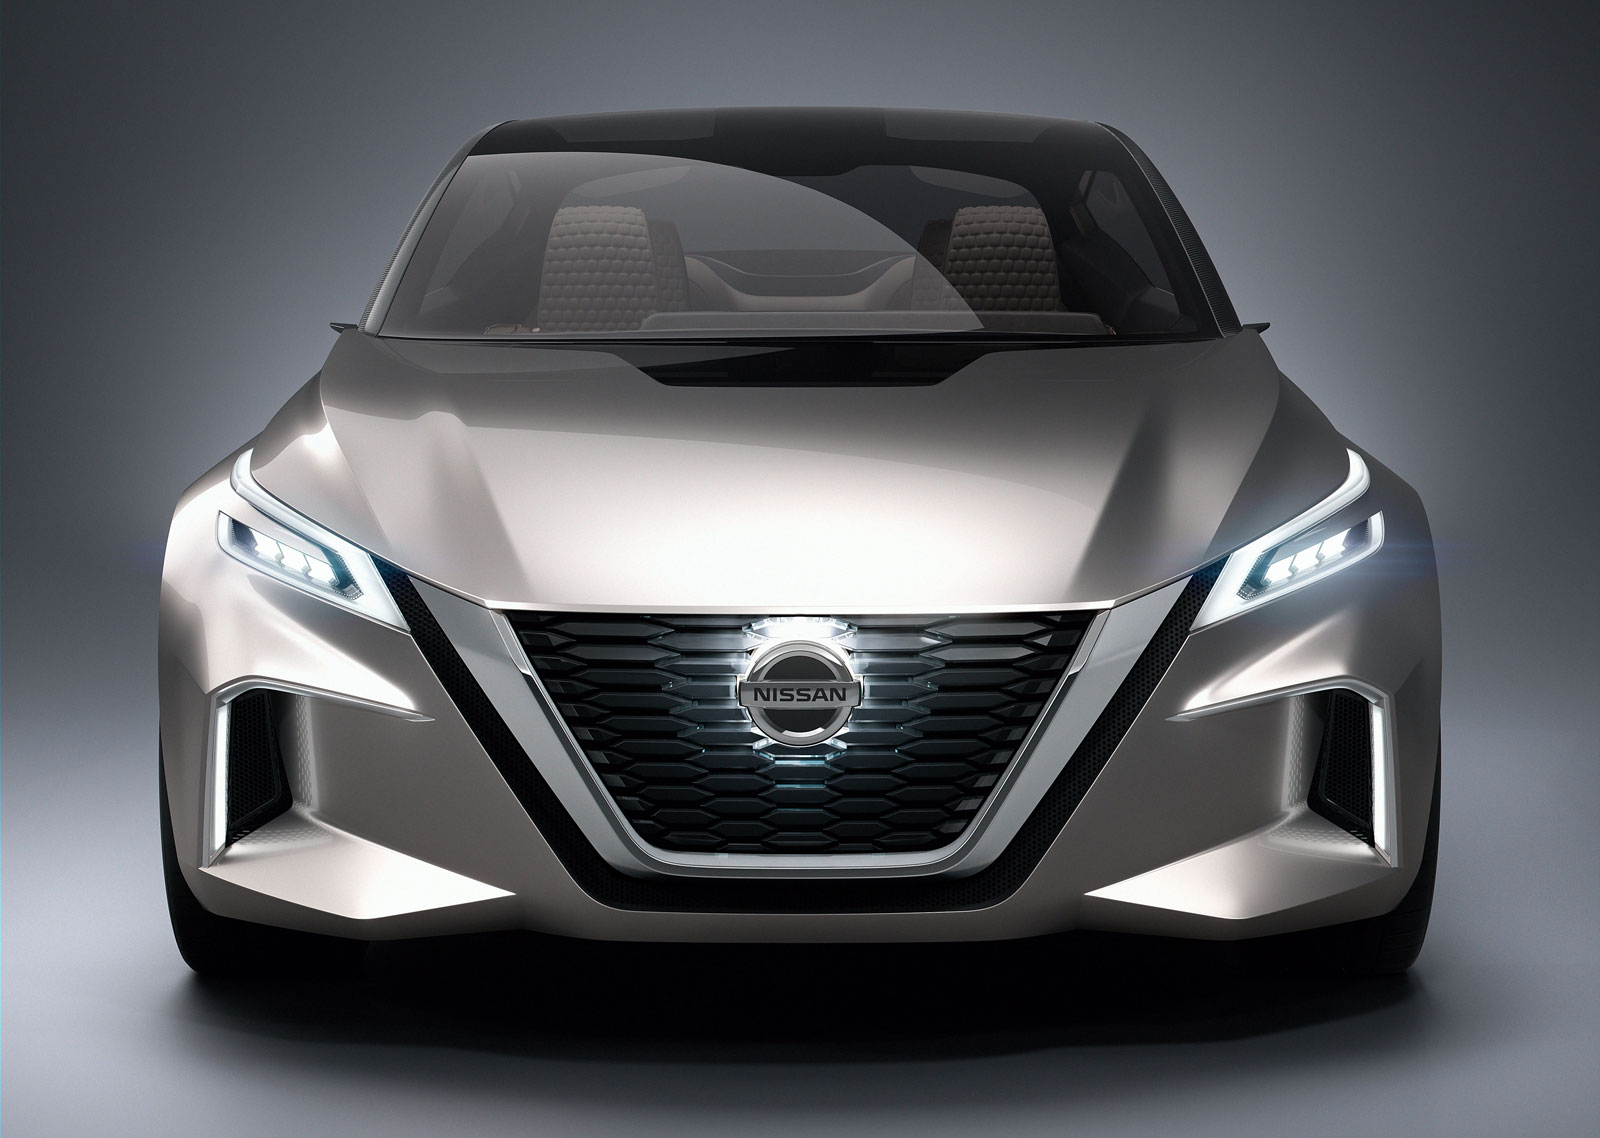 Nissan Vmotion 2.0 Concept - Car Body Design